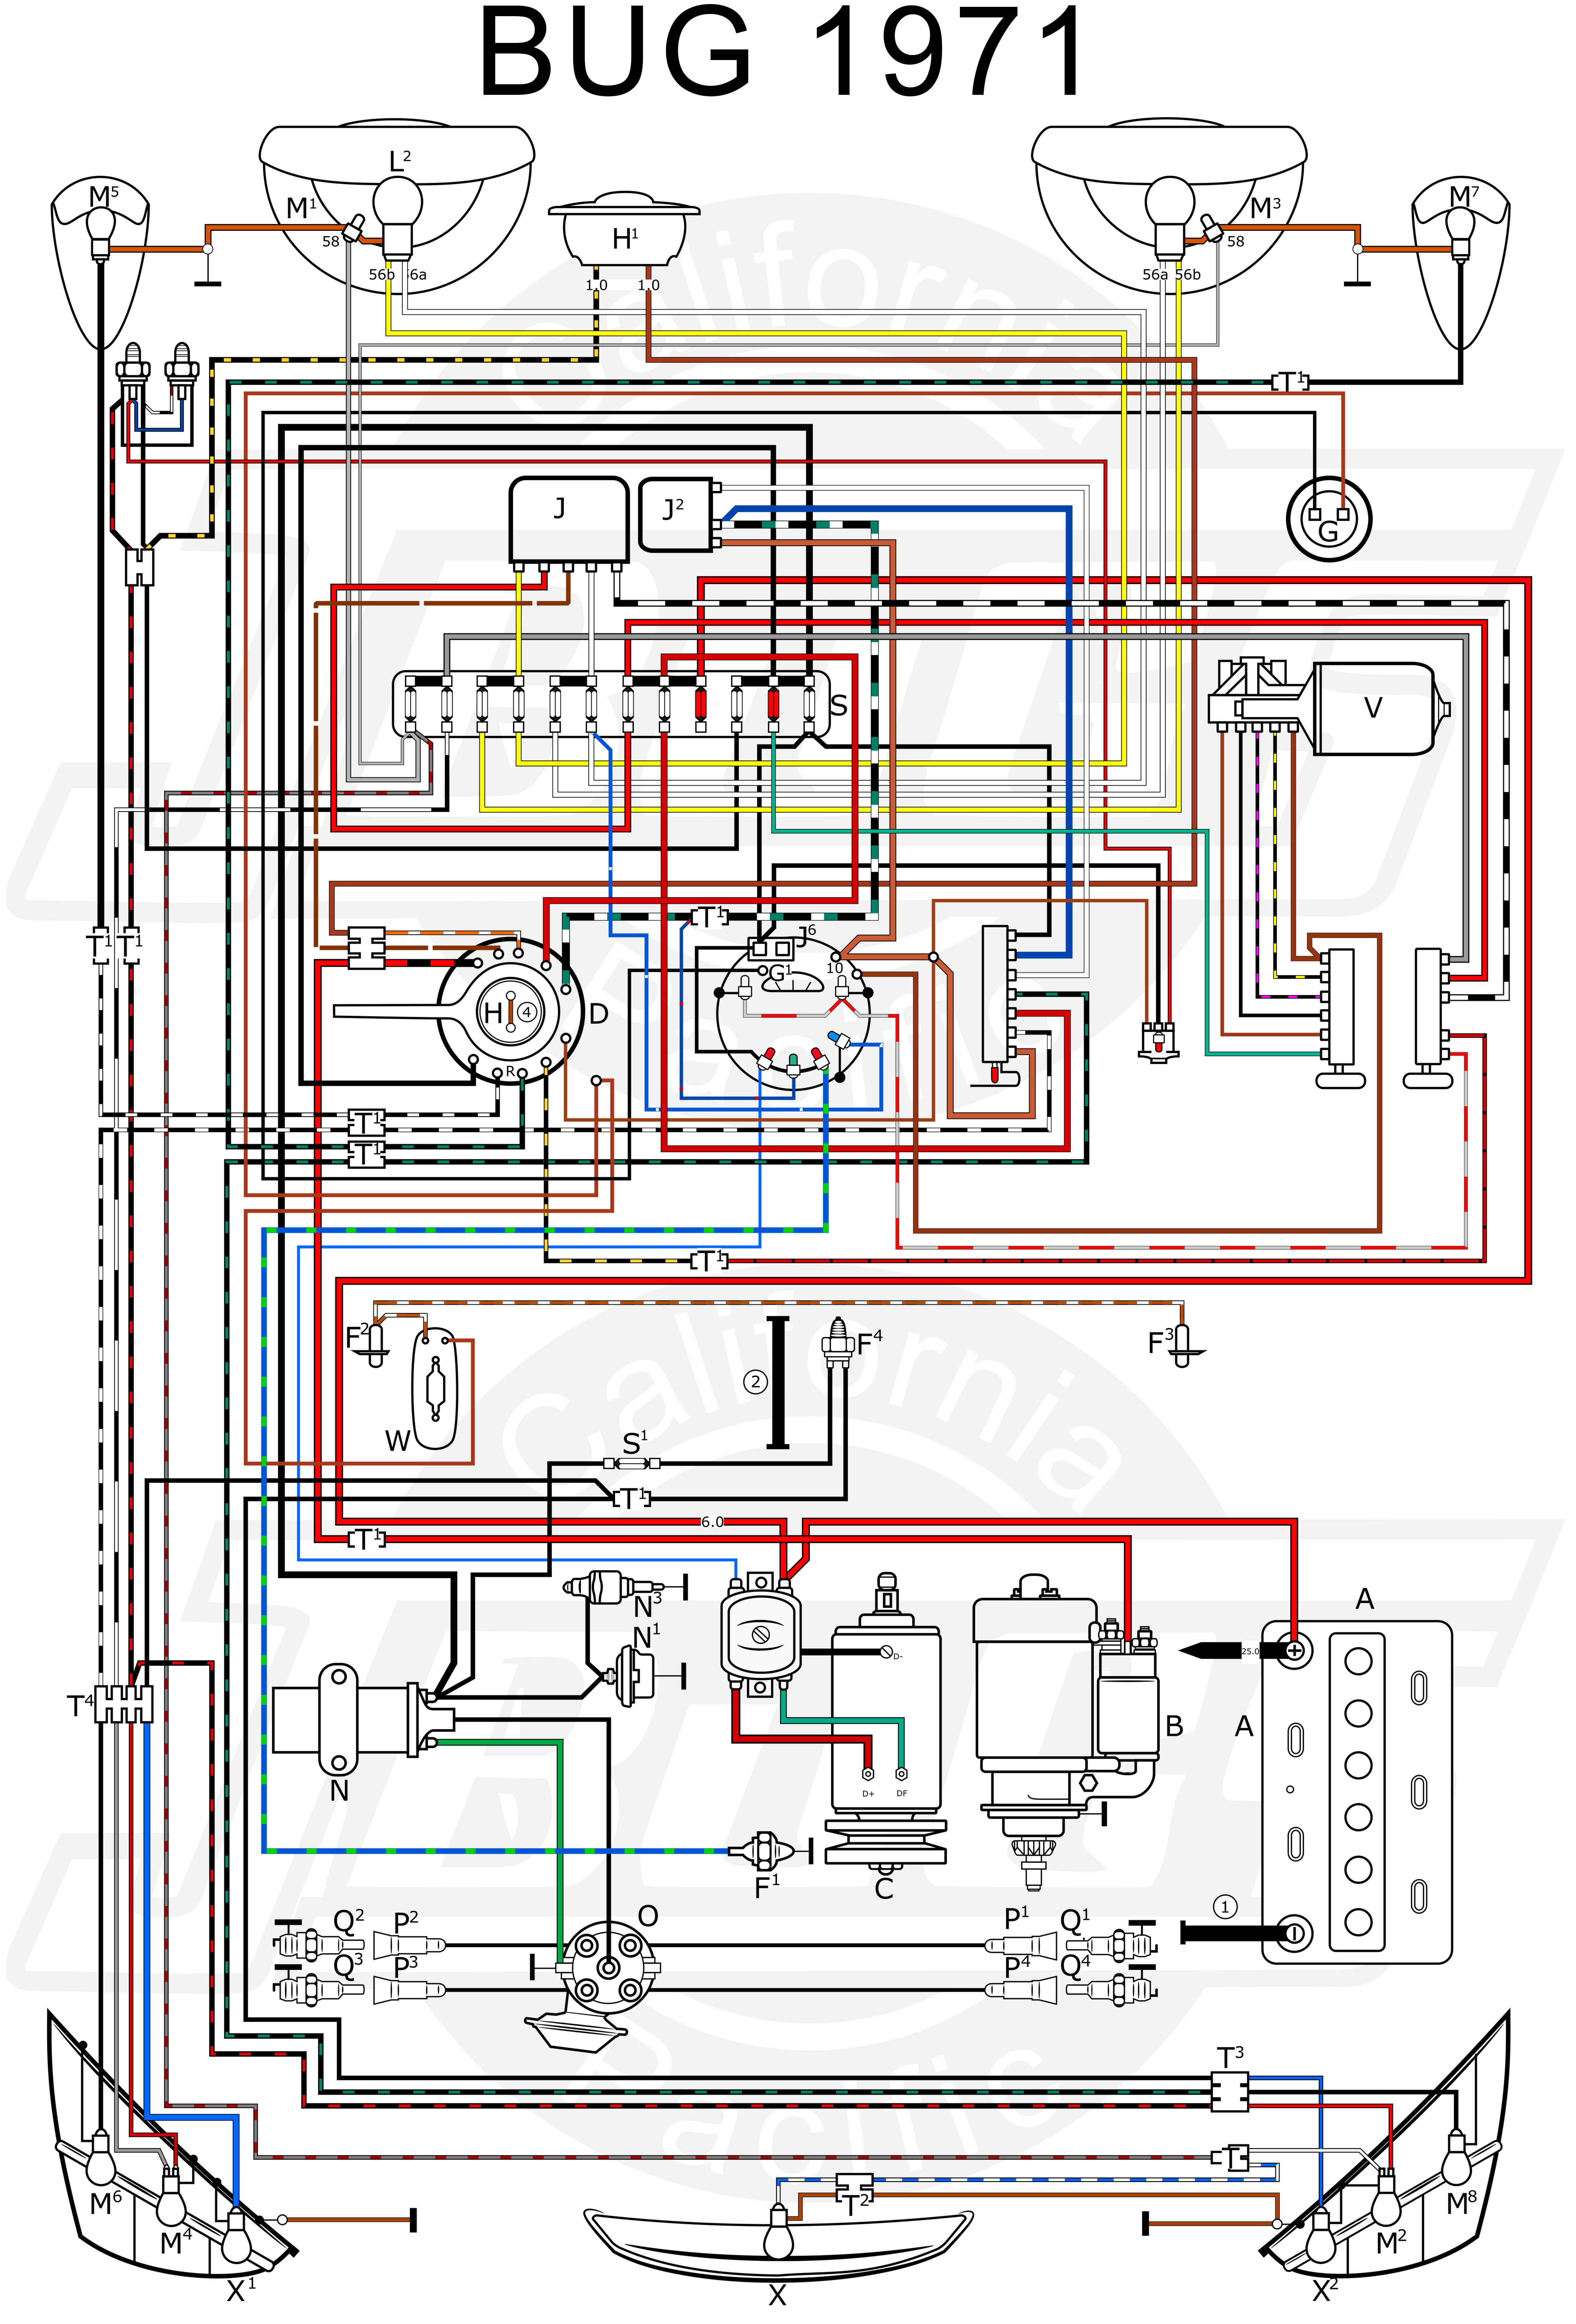 1971 Vw Super Beetle Starter Diagram Wiring